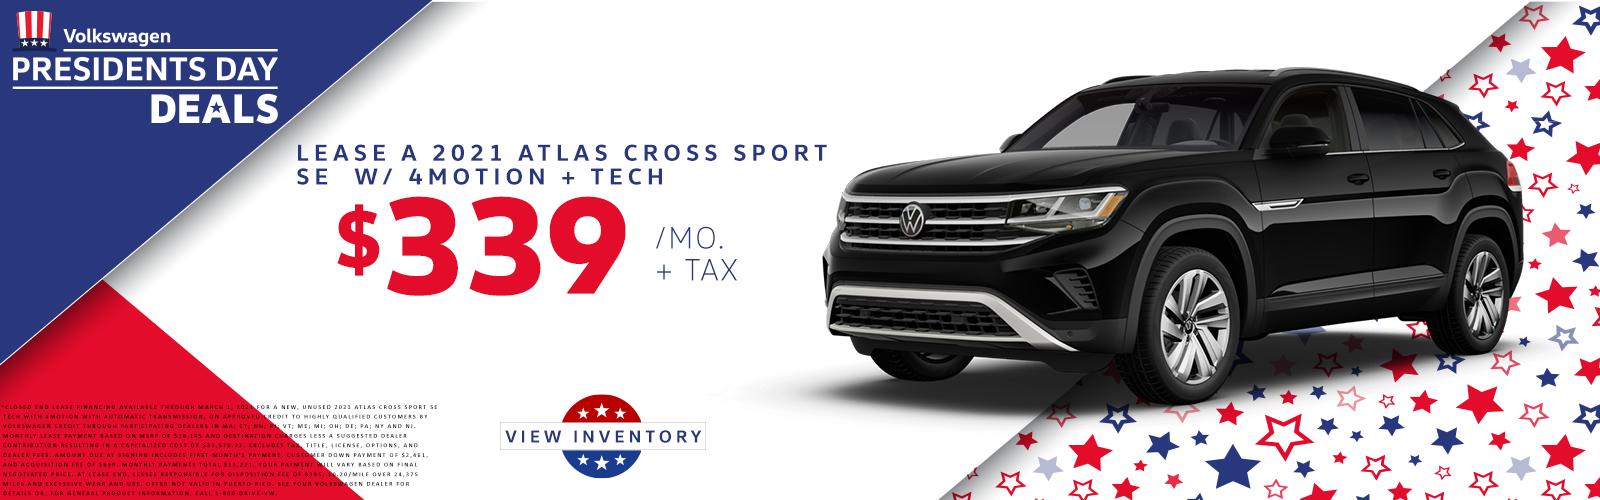 Atlas Cross Sport Special_Feb 2021